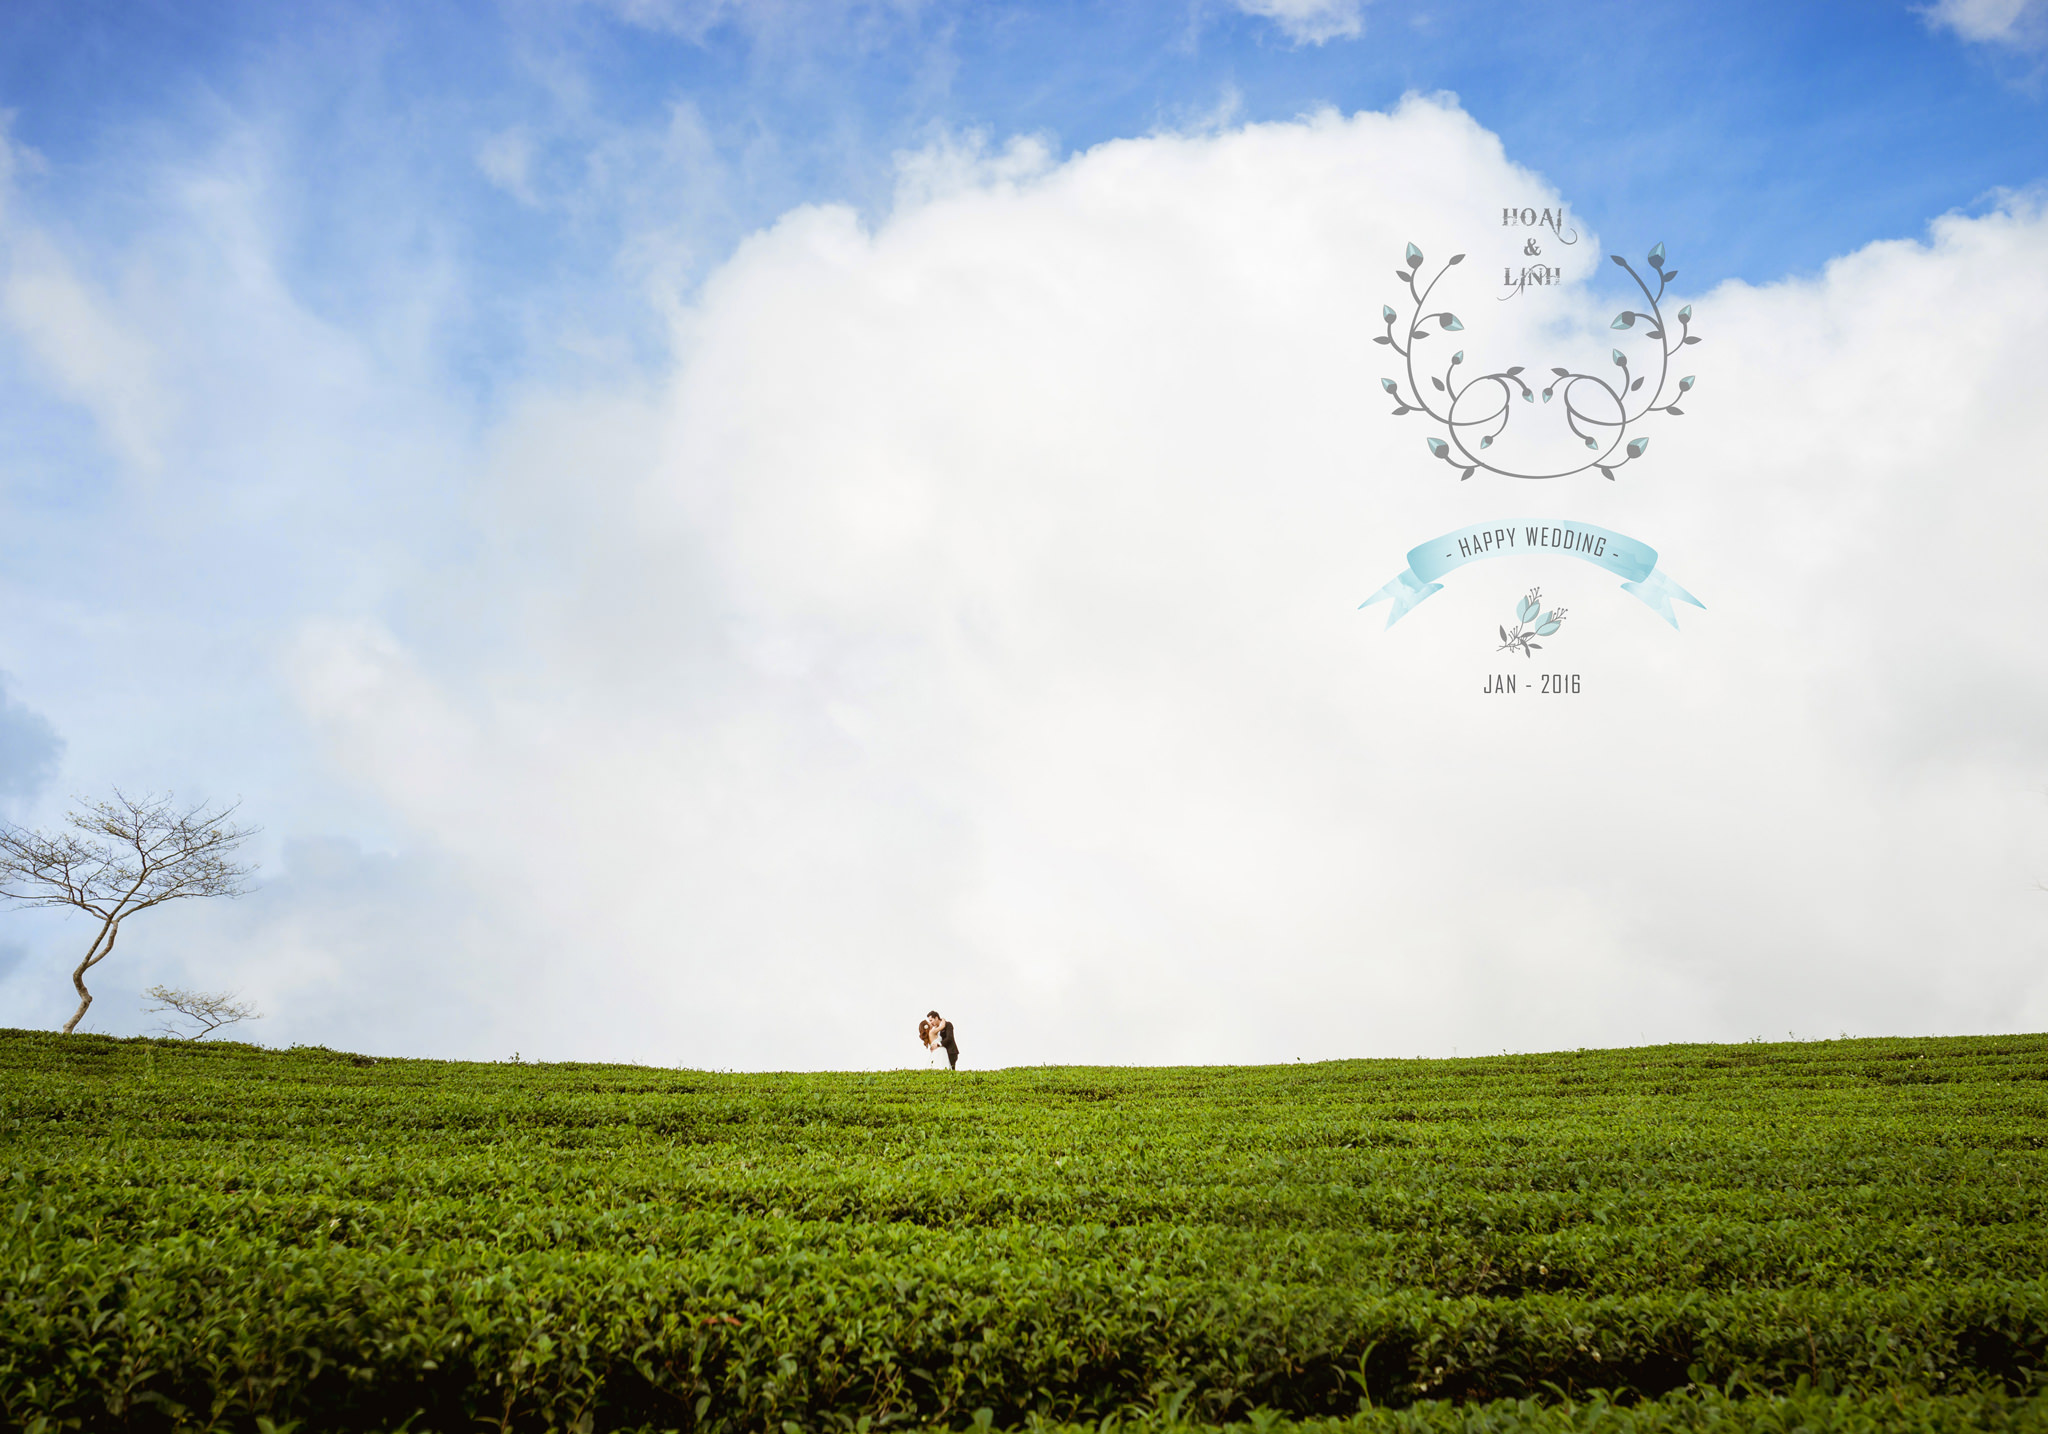 Layout Hoai & Linh (7).jpg